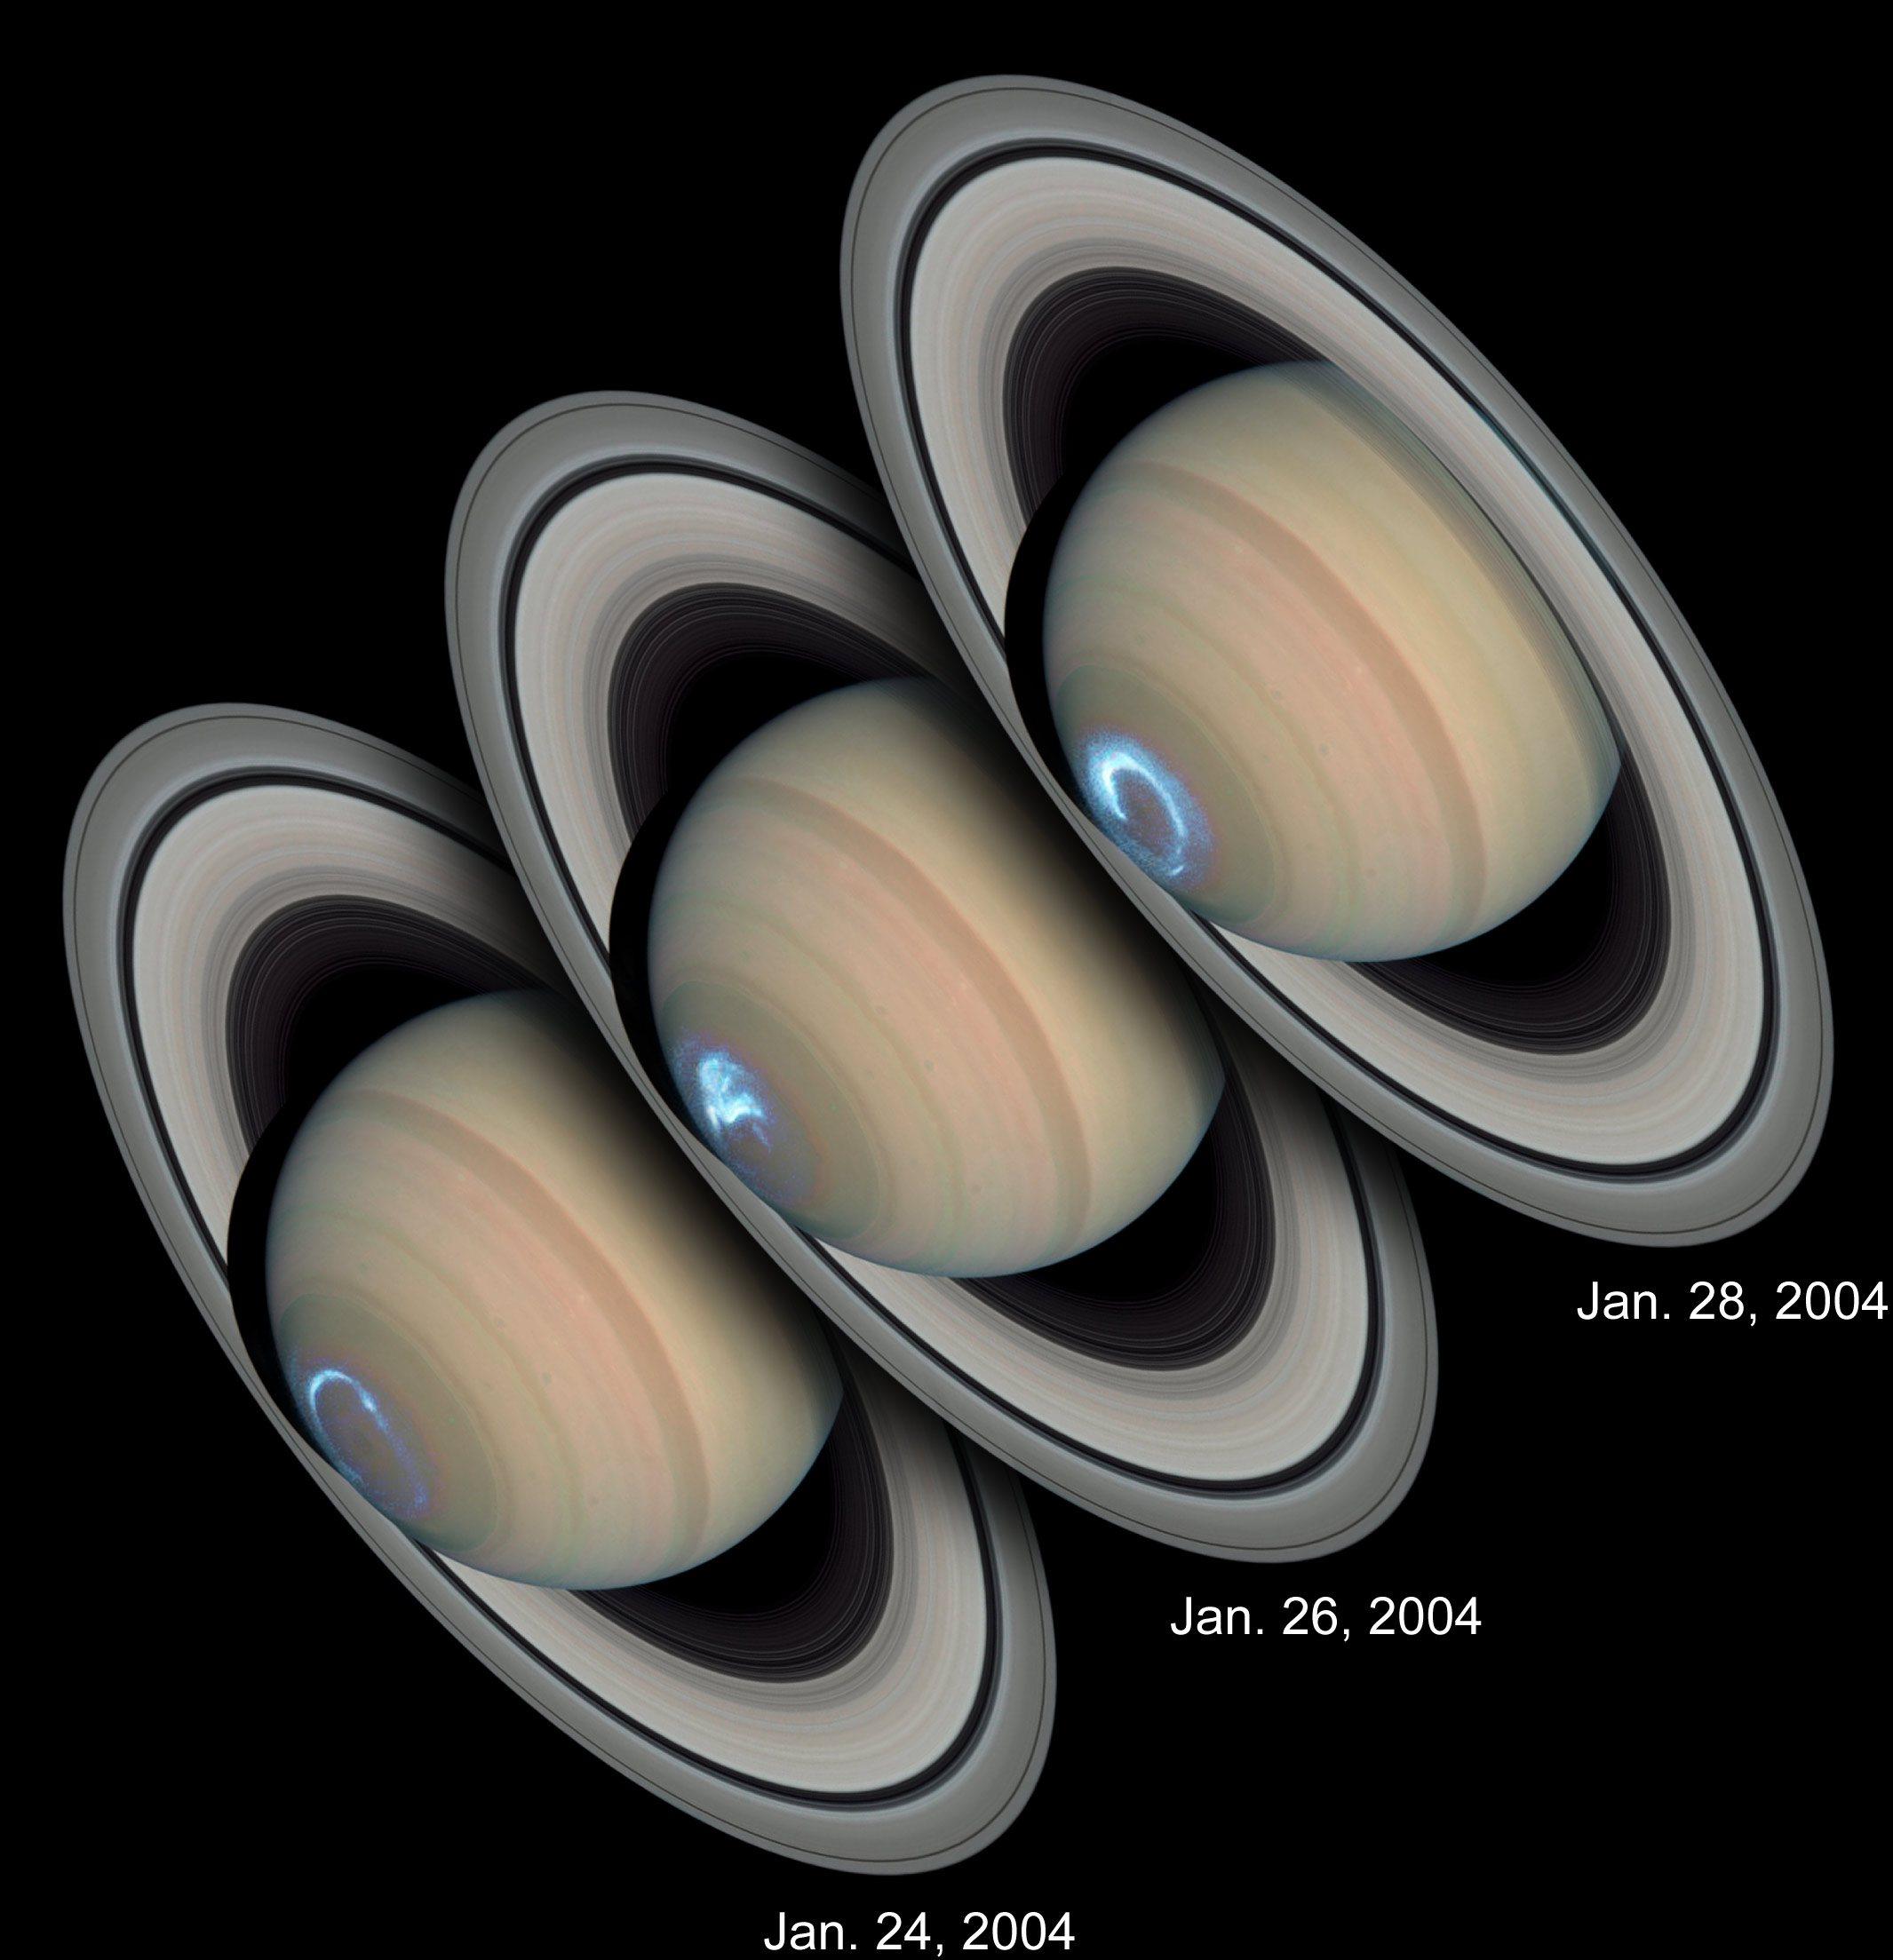 НАСА опубликовало снимки полярного сияния на Уране - 3